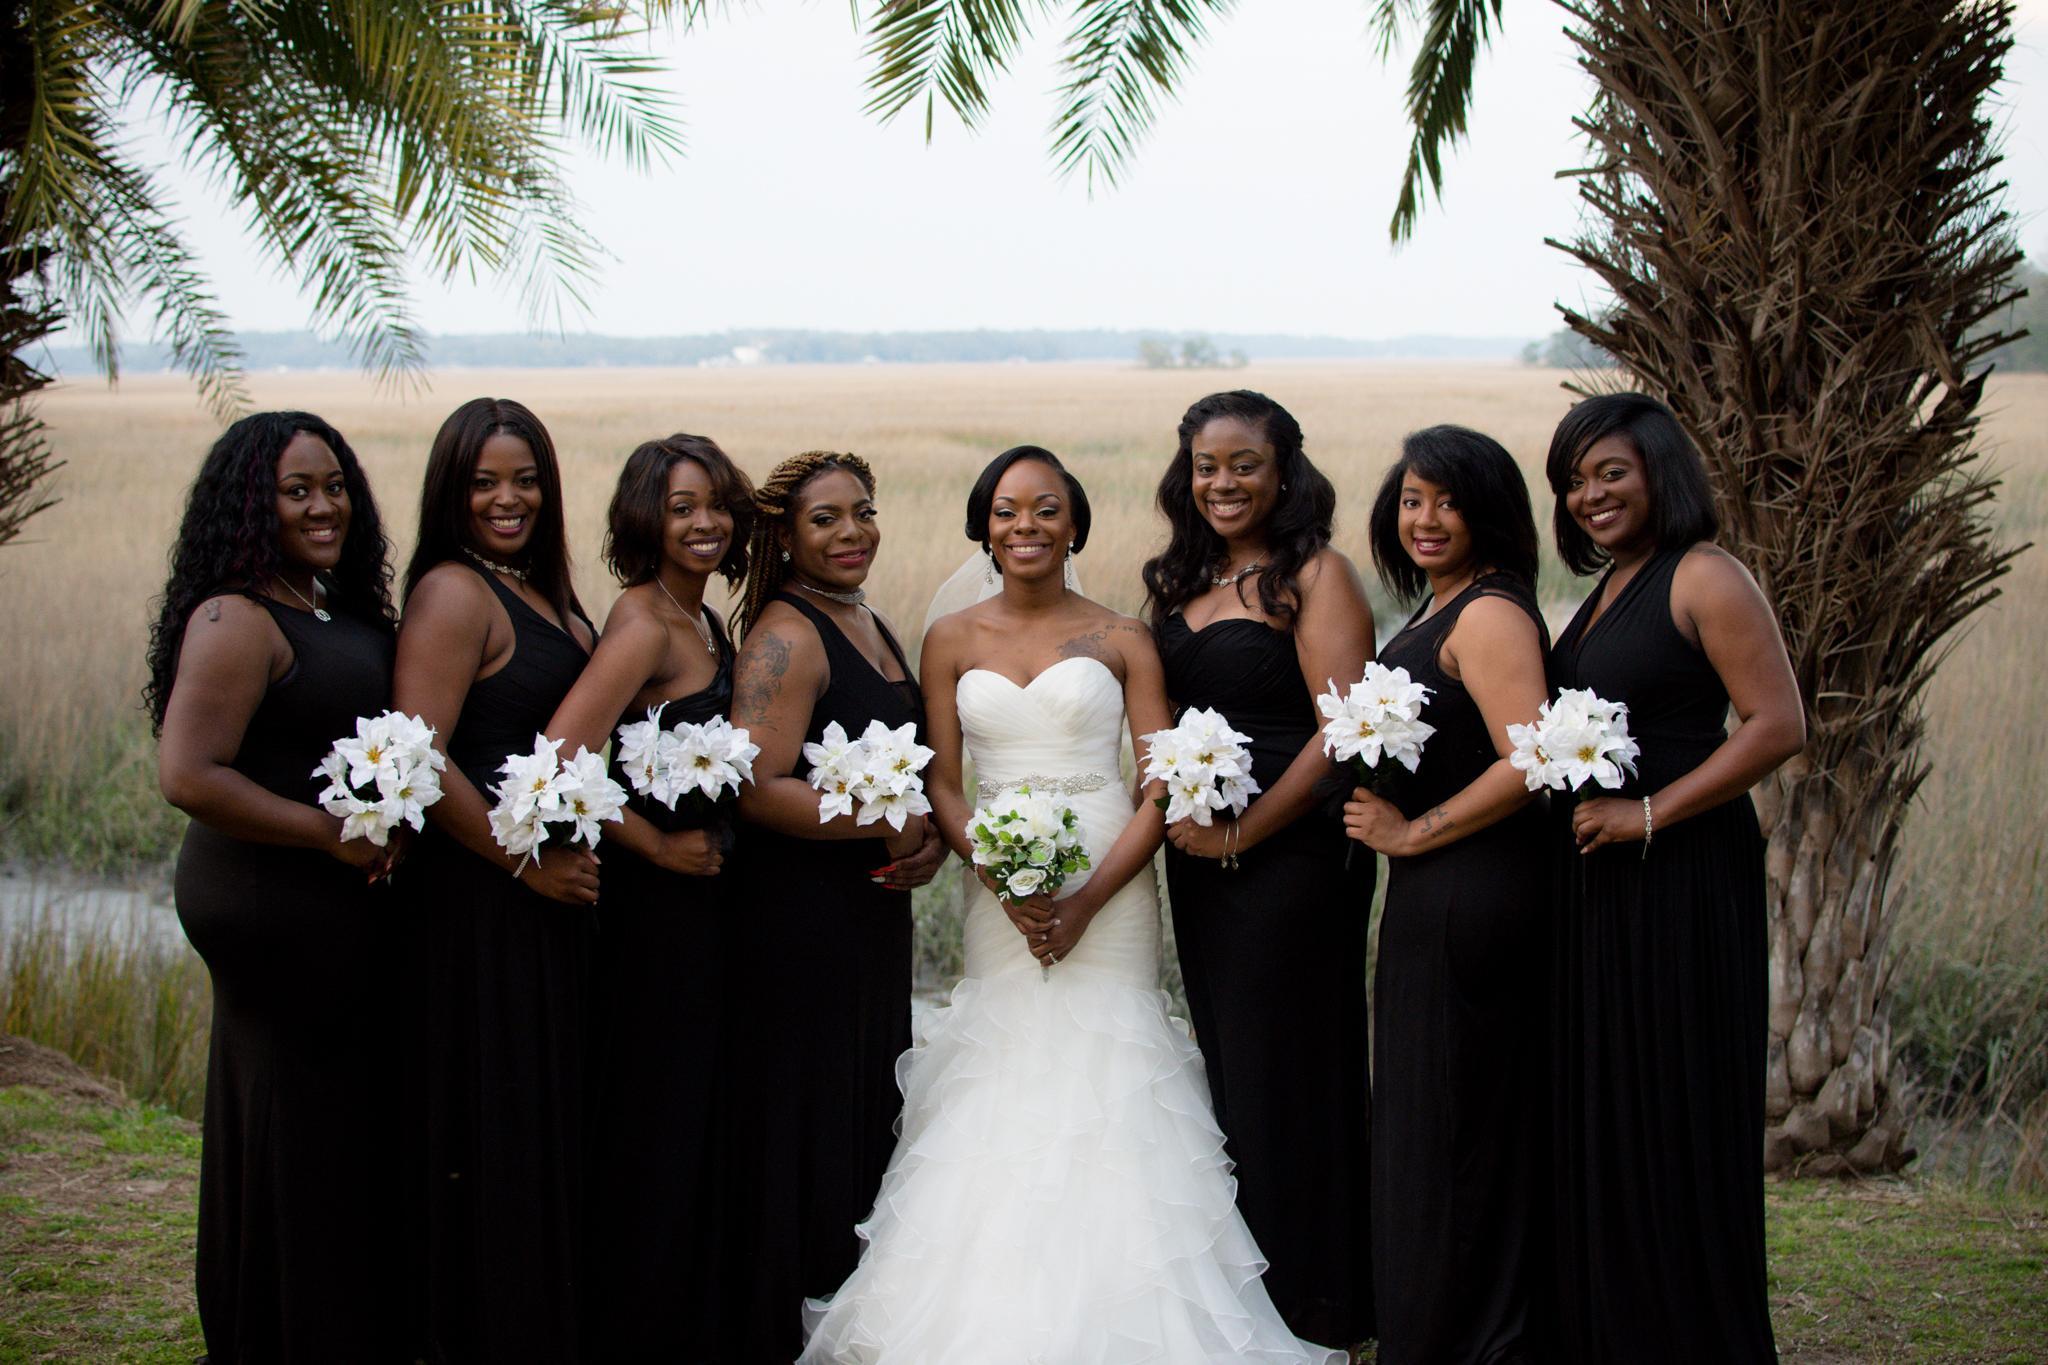 chaplin wedding (106 of 181).JPG